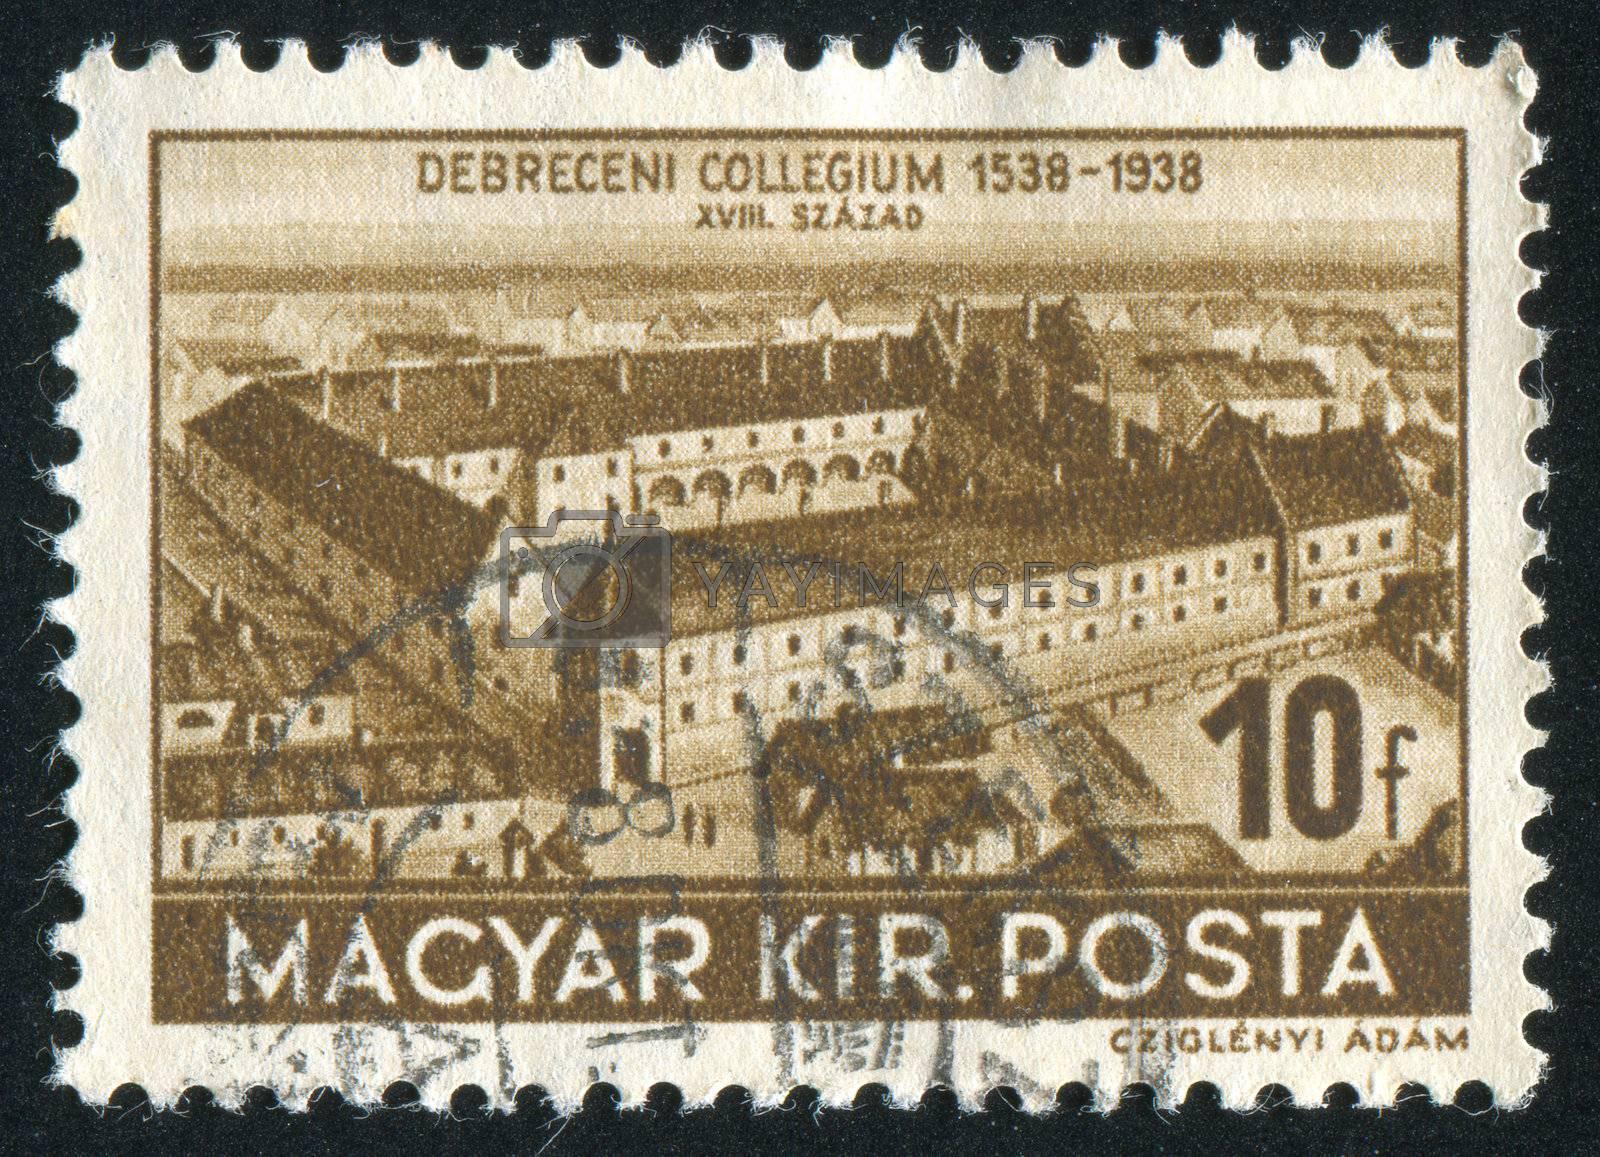 HUNGURY - CIRCA 1938: stamp printed by Hungury, shows College of Debrecen, circa 1938